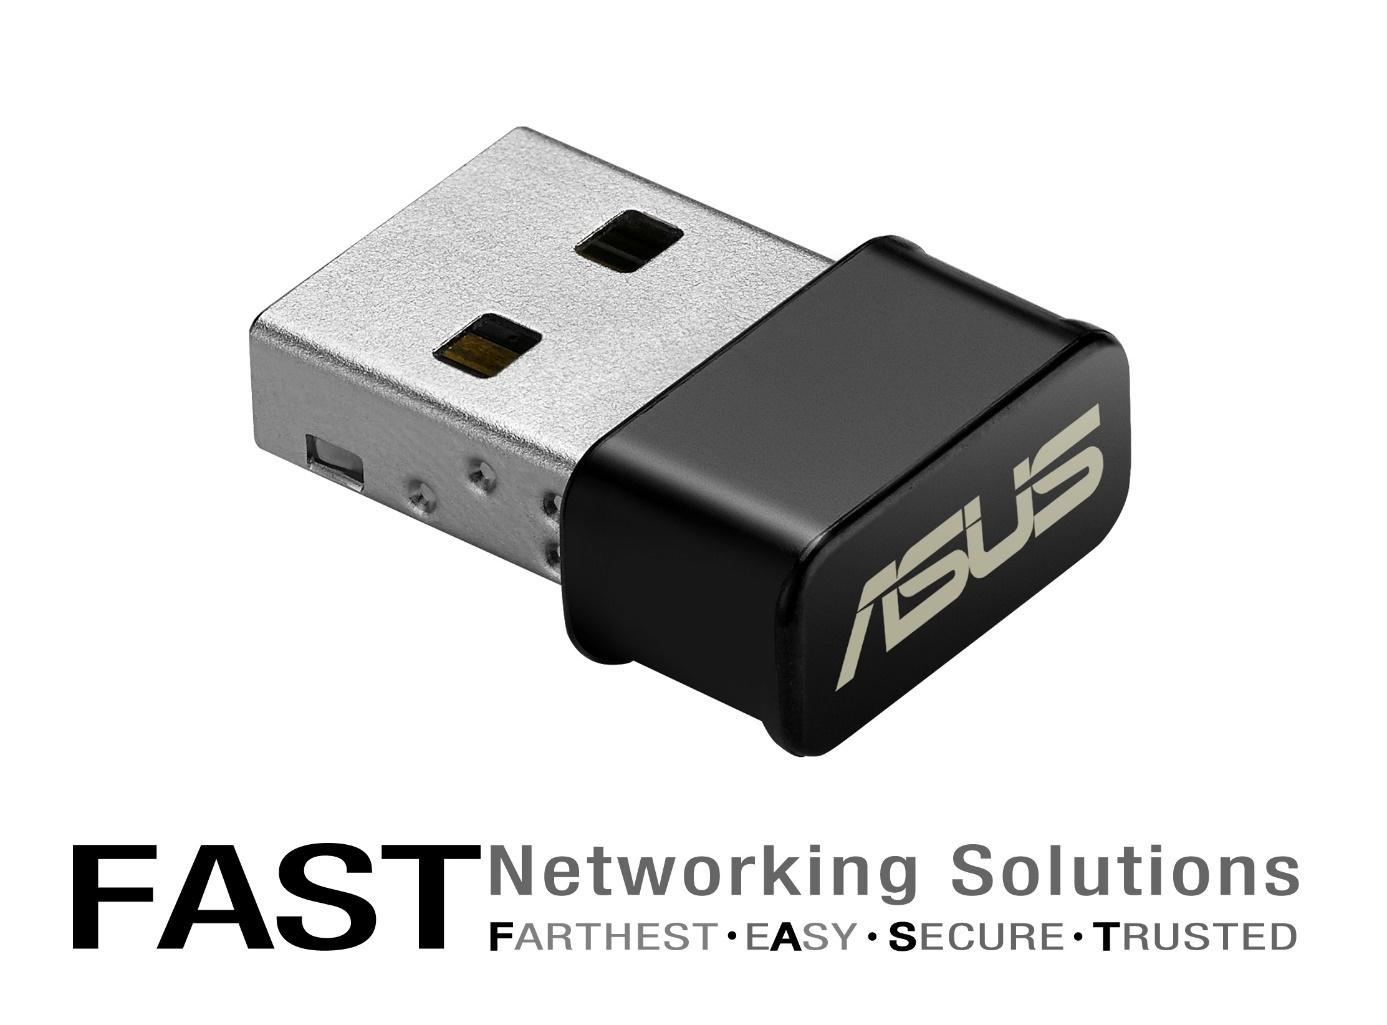 \\acn-fs-01\MKT\PRODUKTBESKRIVNINGAR\Content\OPBG\Network\USB-AC53 Nano\Content Pics\1. ASUS-USB-AC53_Nano-HERO.jpg